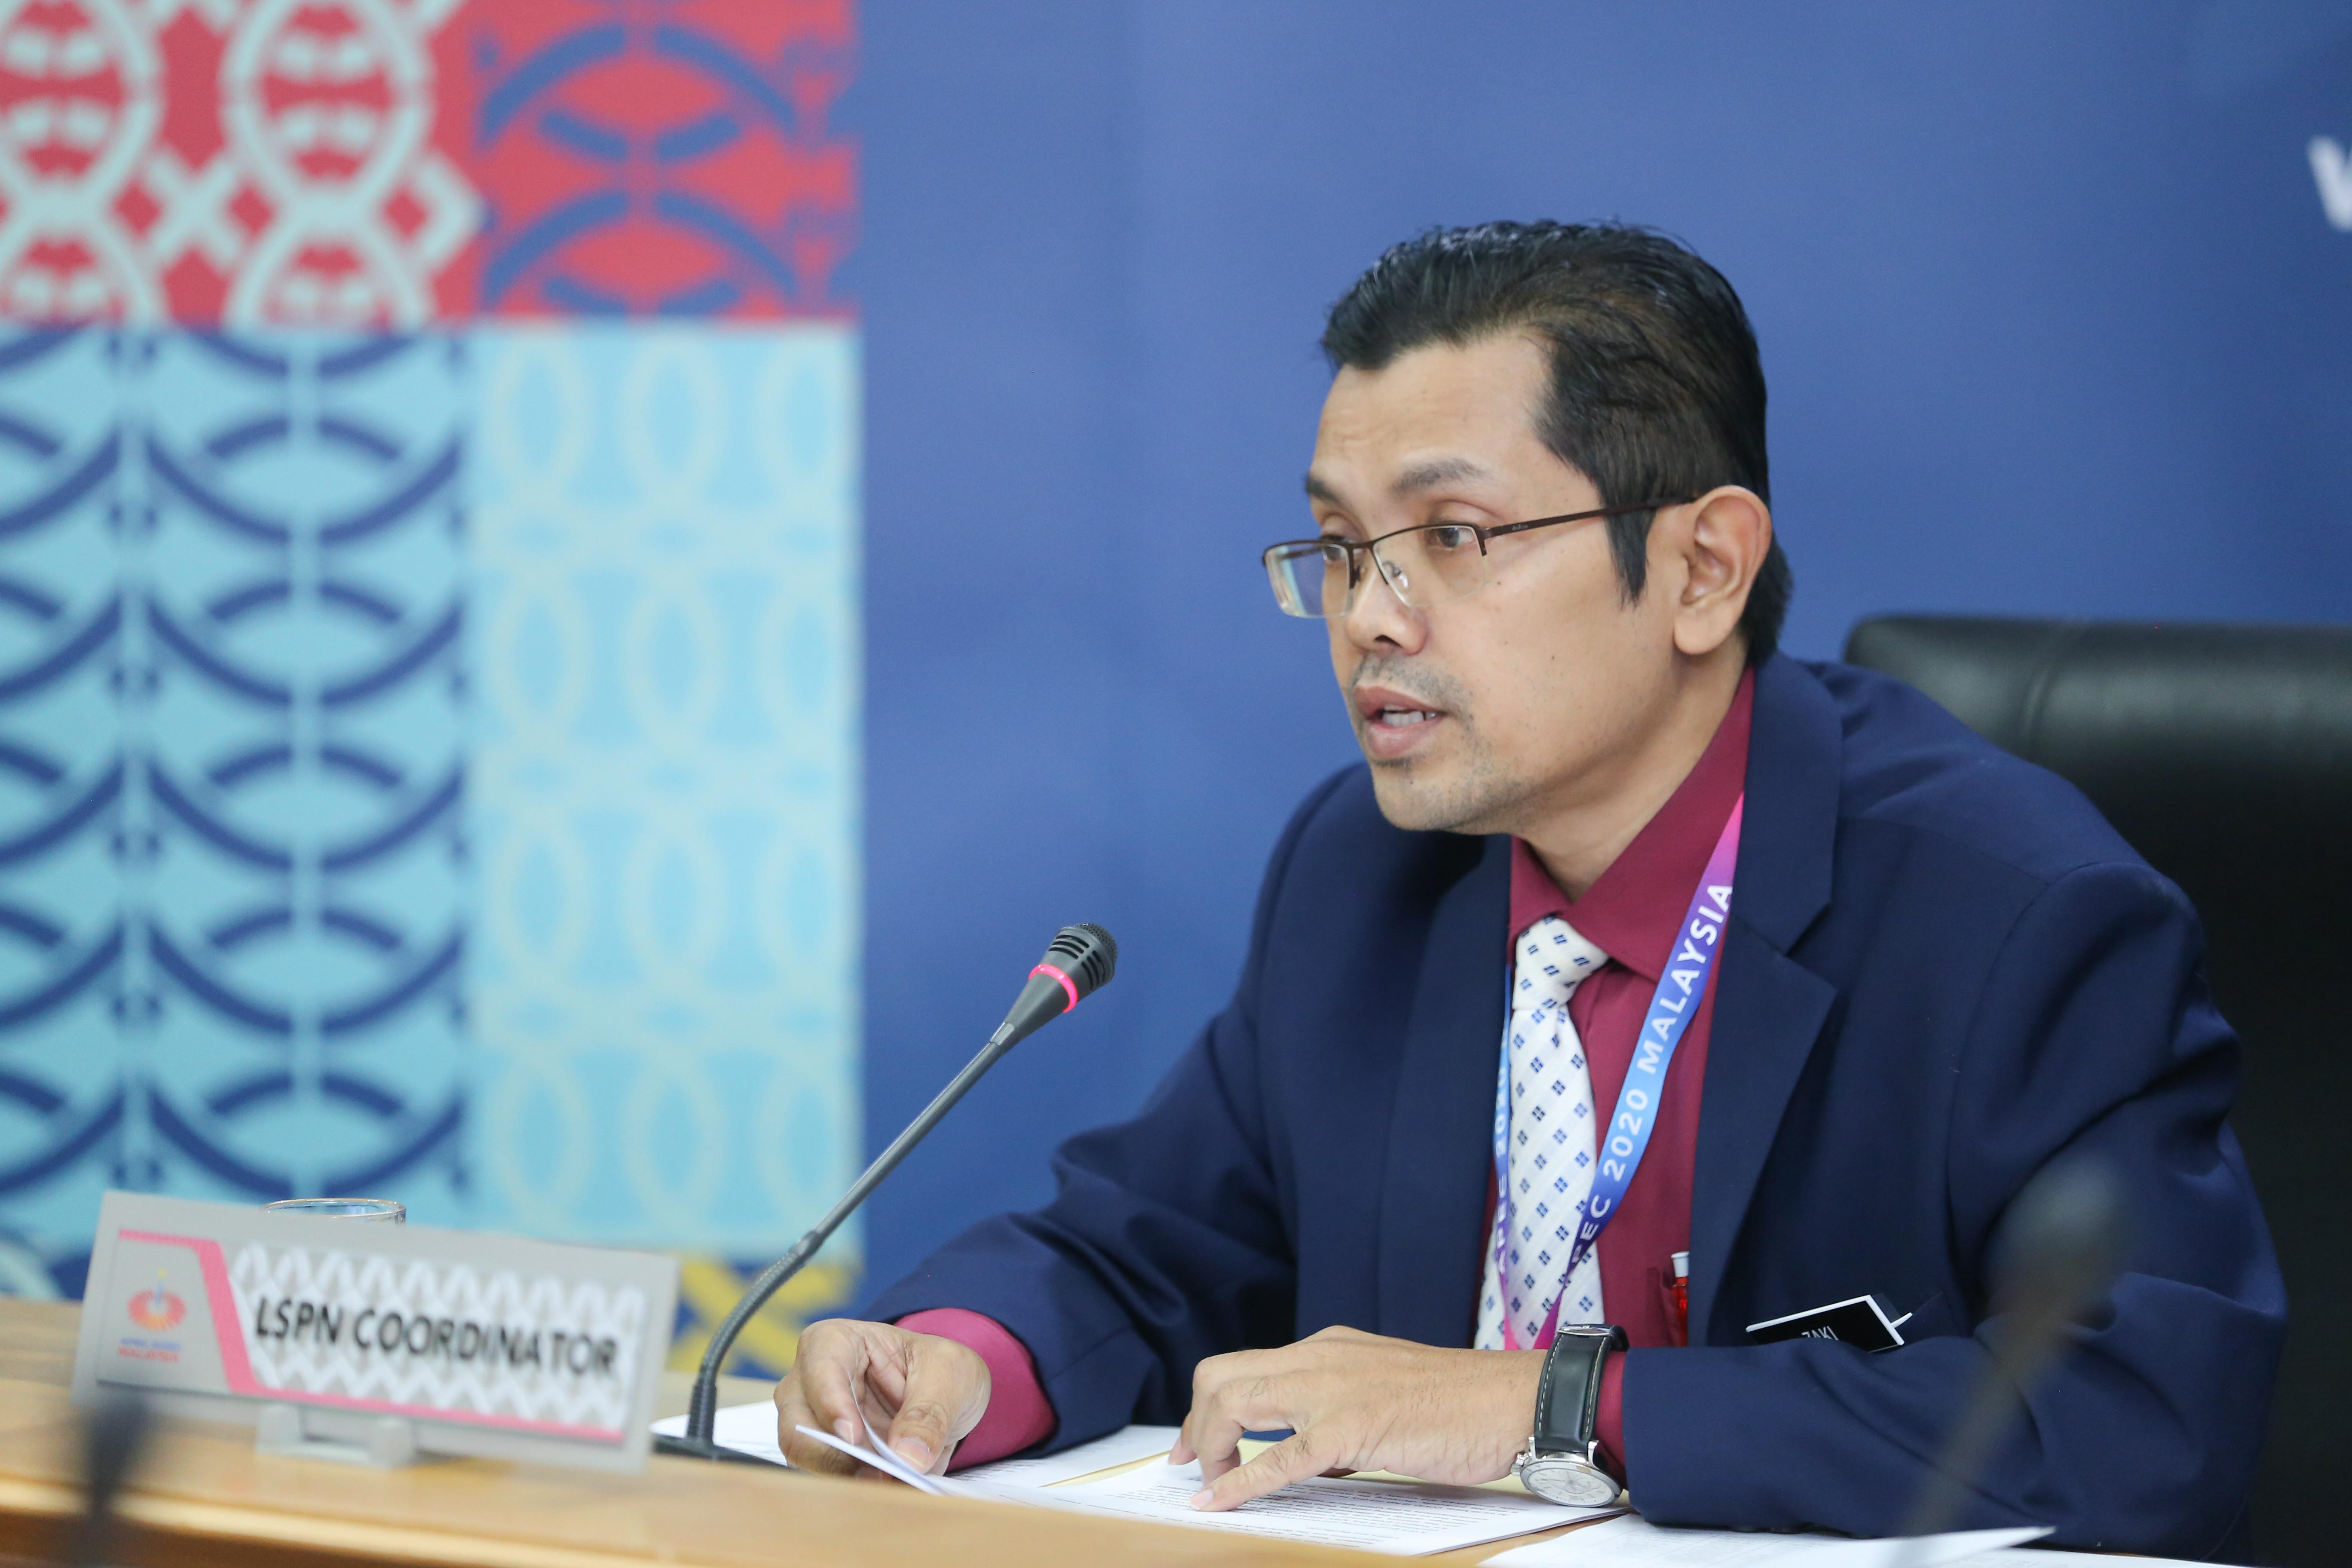 Setiausaha Bahagian Antarabangsa, Kementerian Sumber Manusia (KSM), Dr. Zaki Zakaria